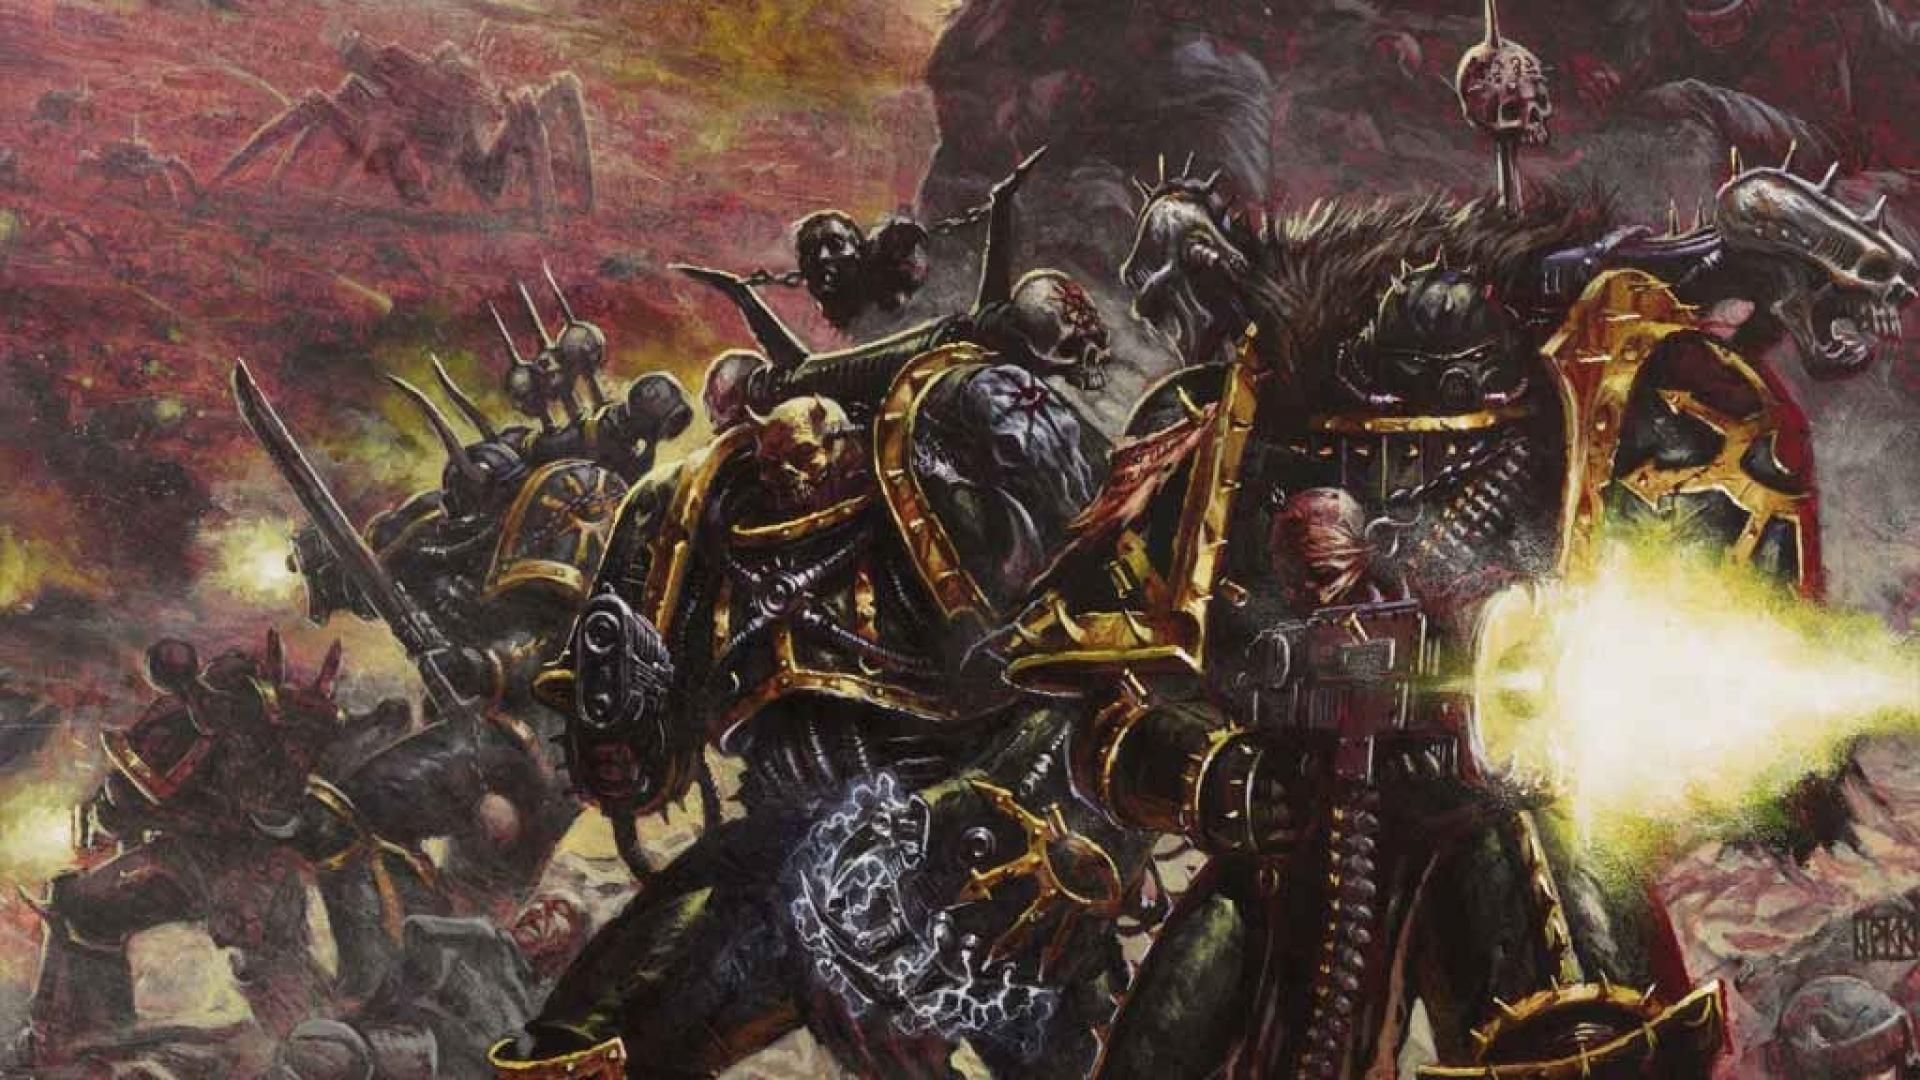 My personal Warhammer 40k wallpaper dump!Enjoy!